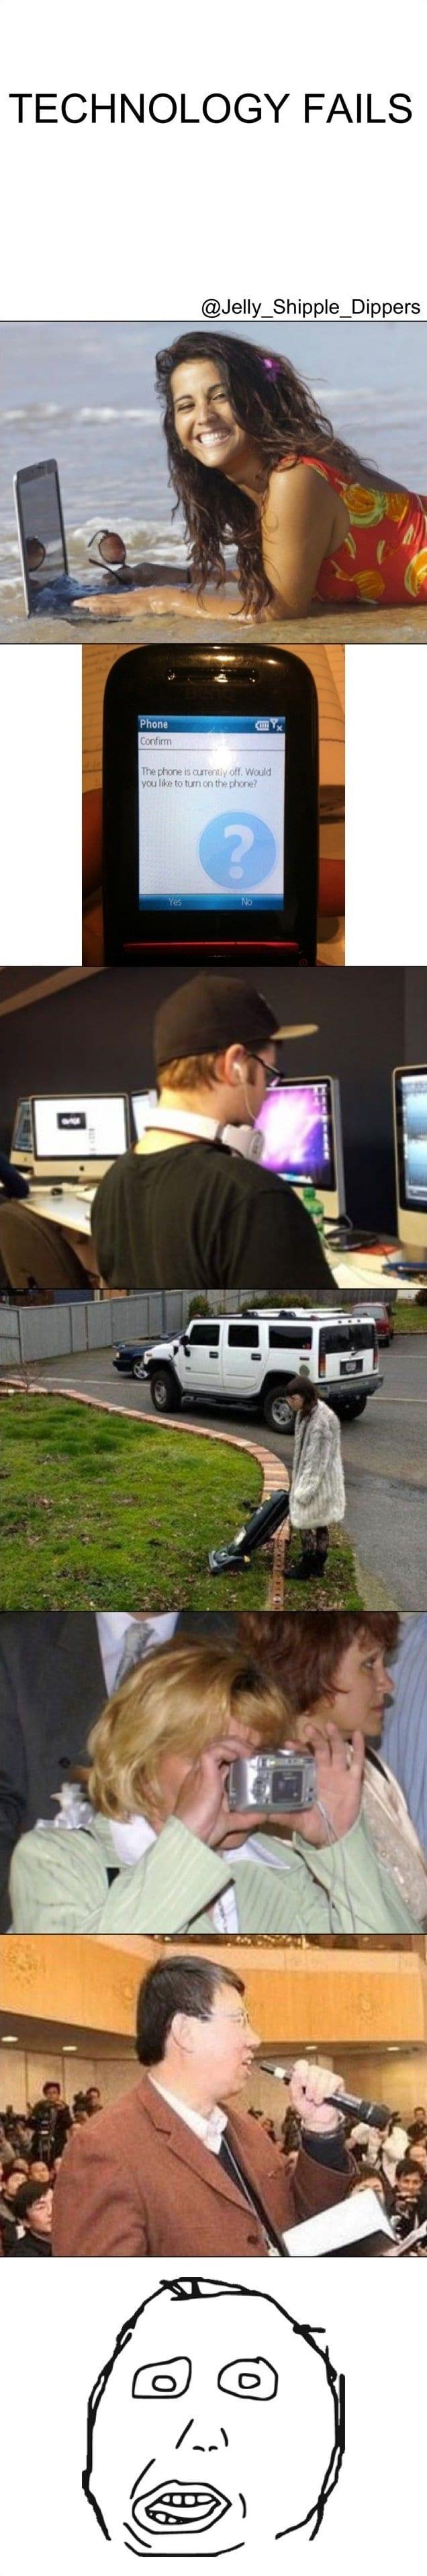 lol-2014-technology-fails-lol